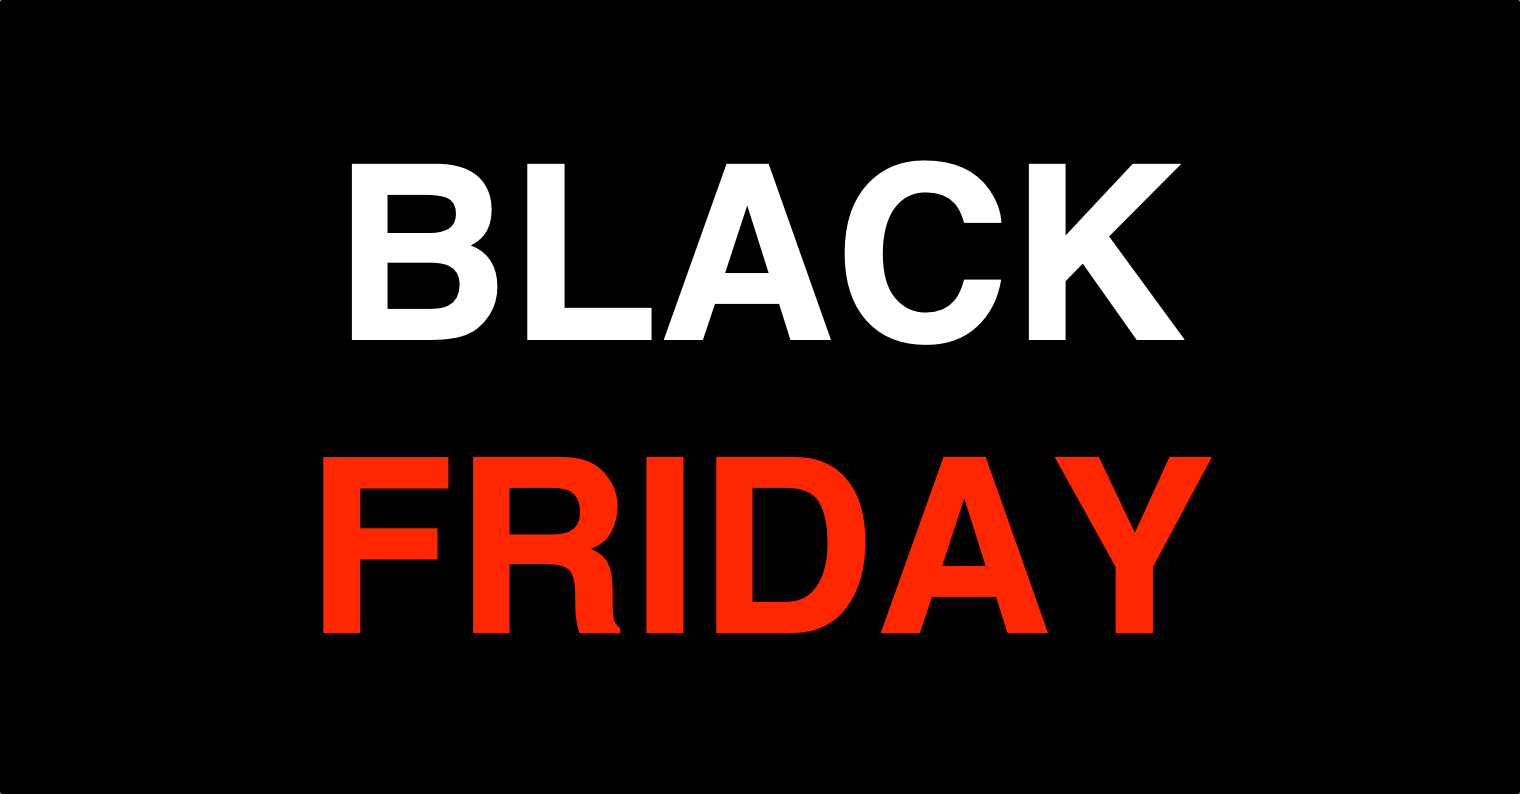 Black Friday cerny patek